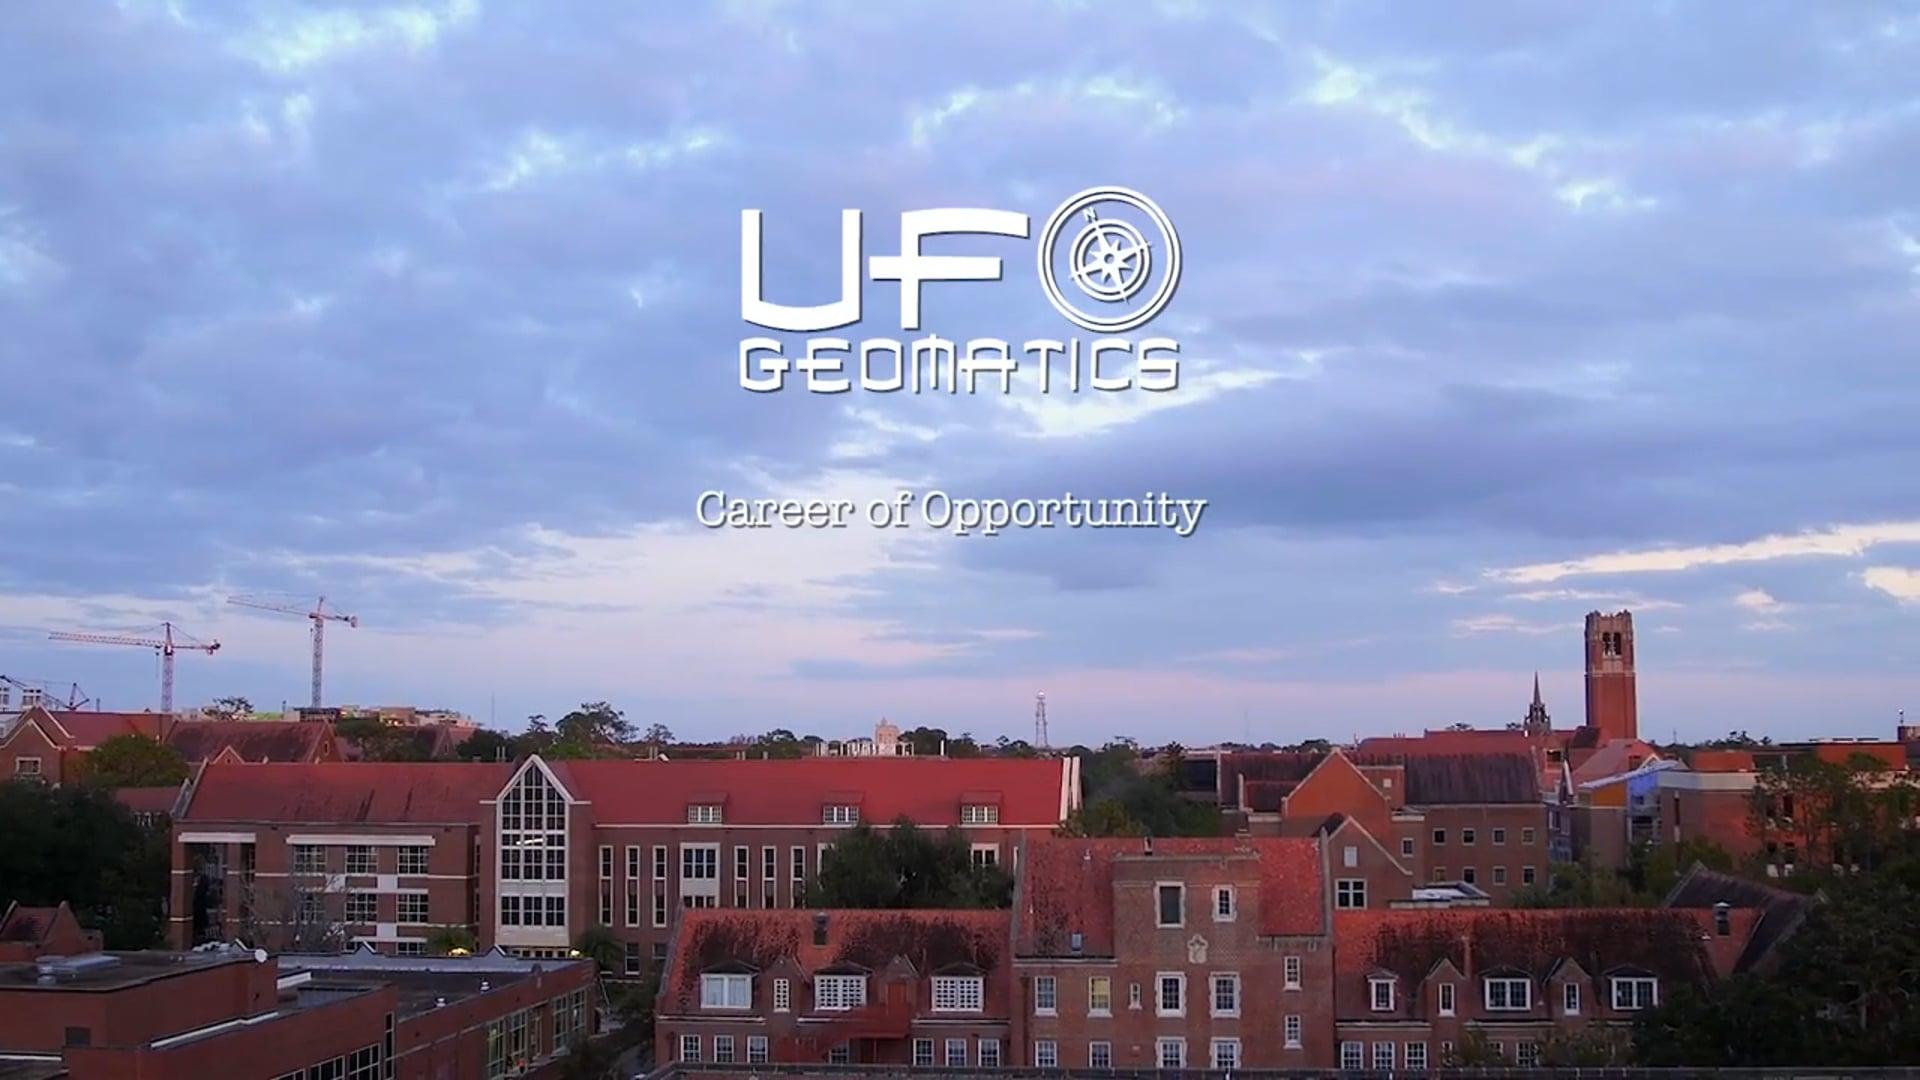 UF Geomatics - Career Of Opportunity (Promo)